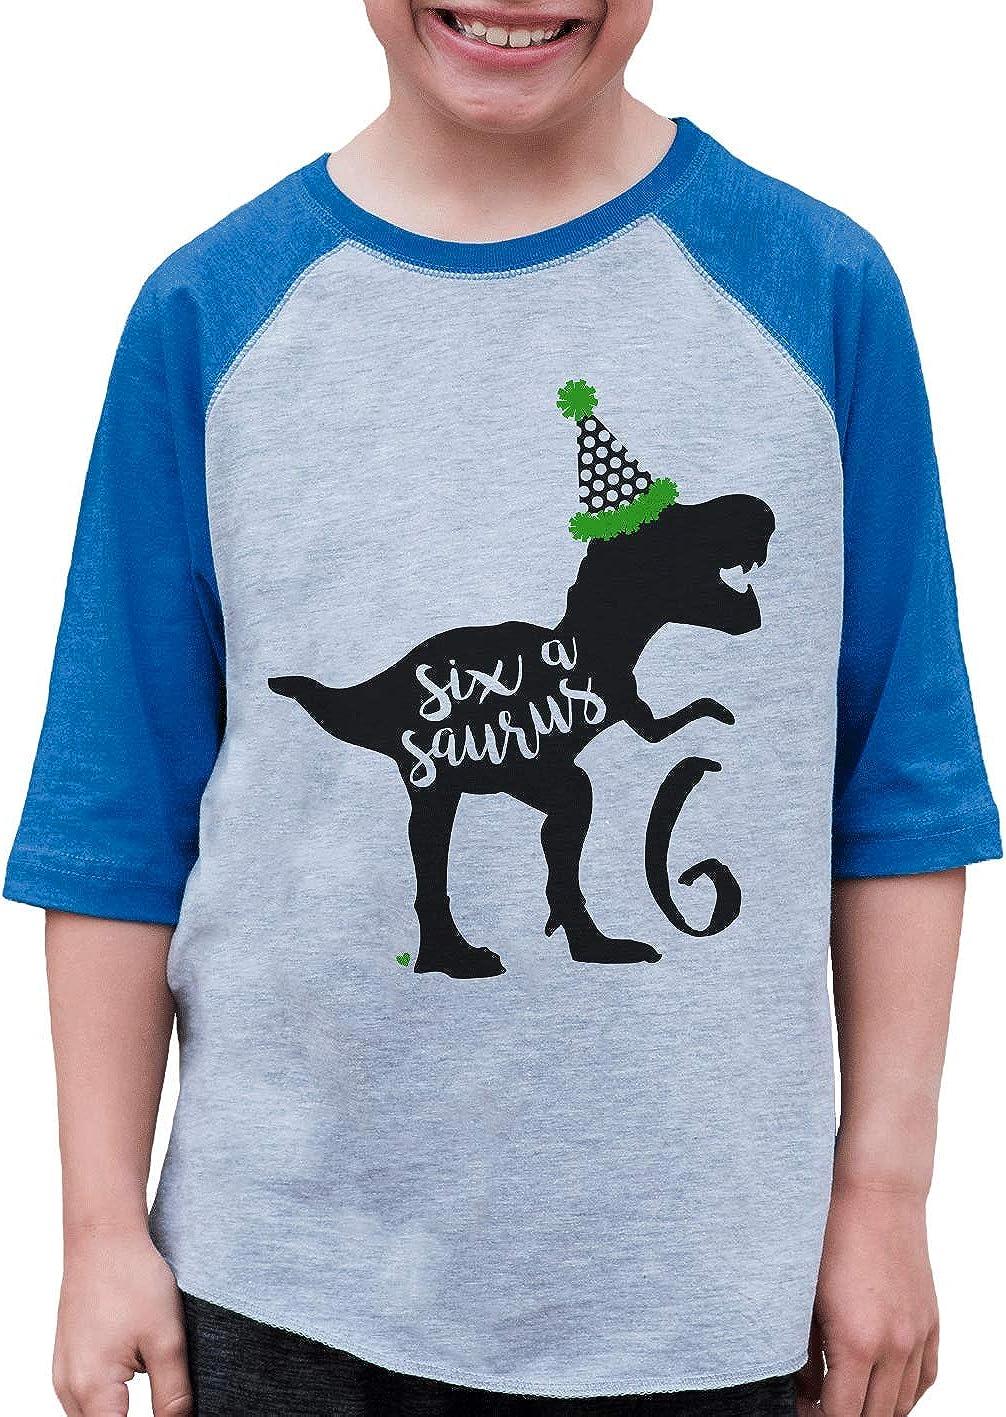 7 ate 9 Apparel Kid's Six 6 Sixth 6th Dinosaur Dino Birthday Blue Raglan Tee